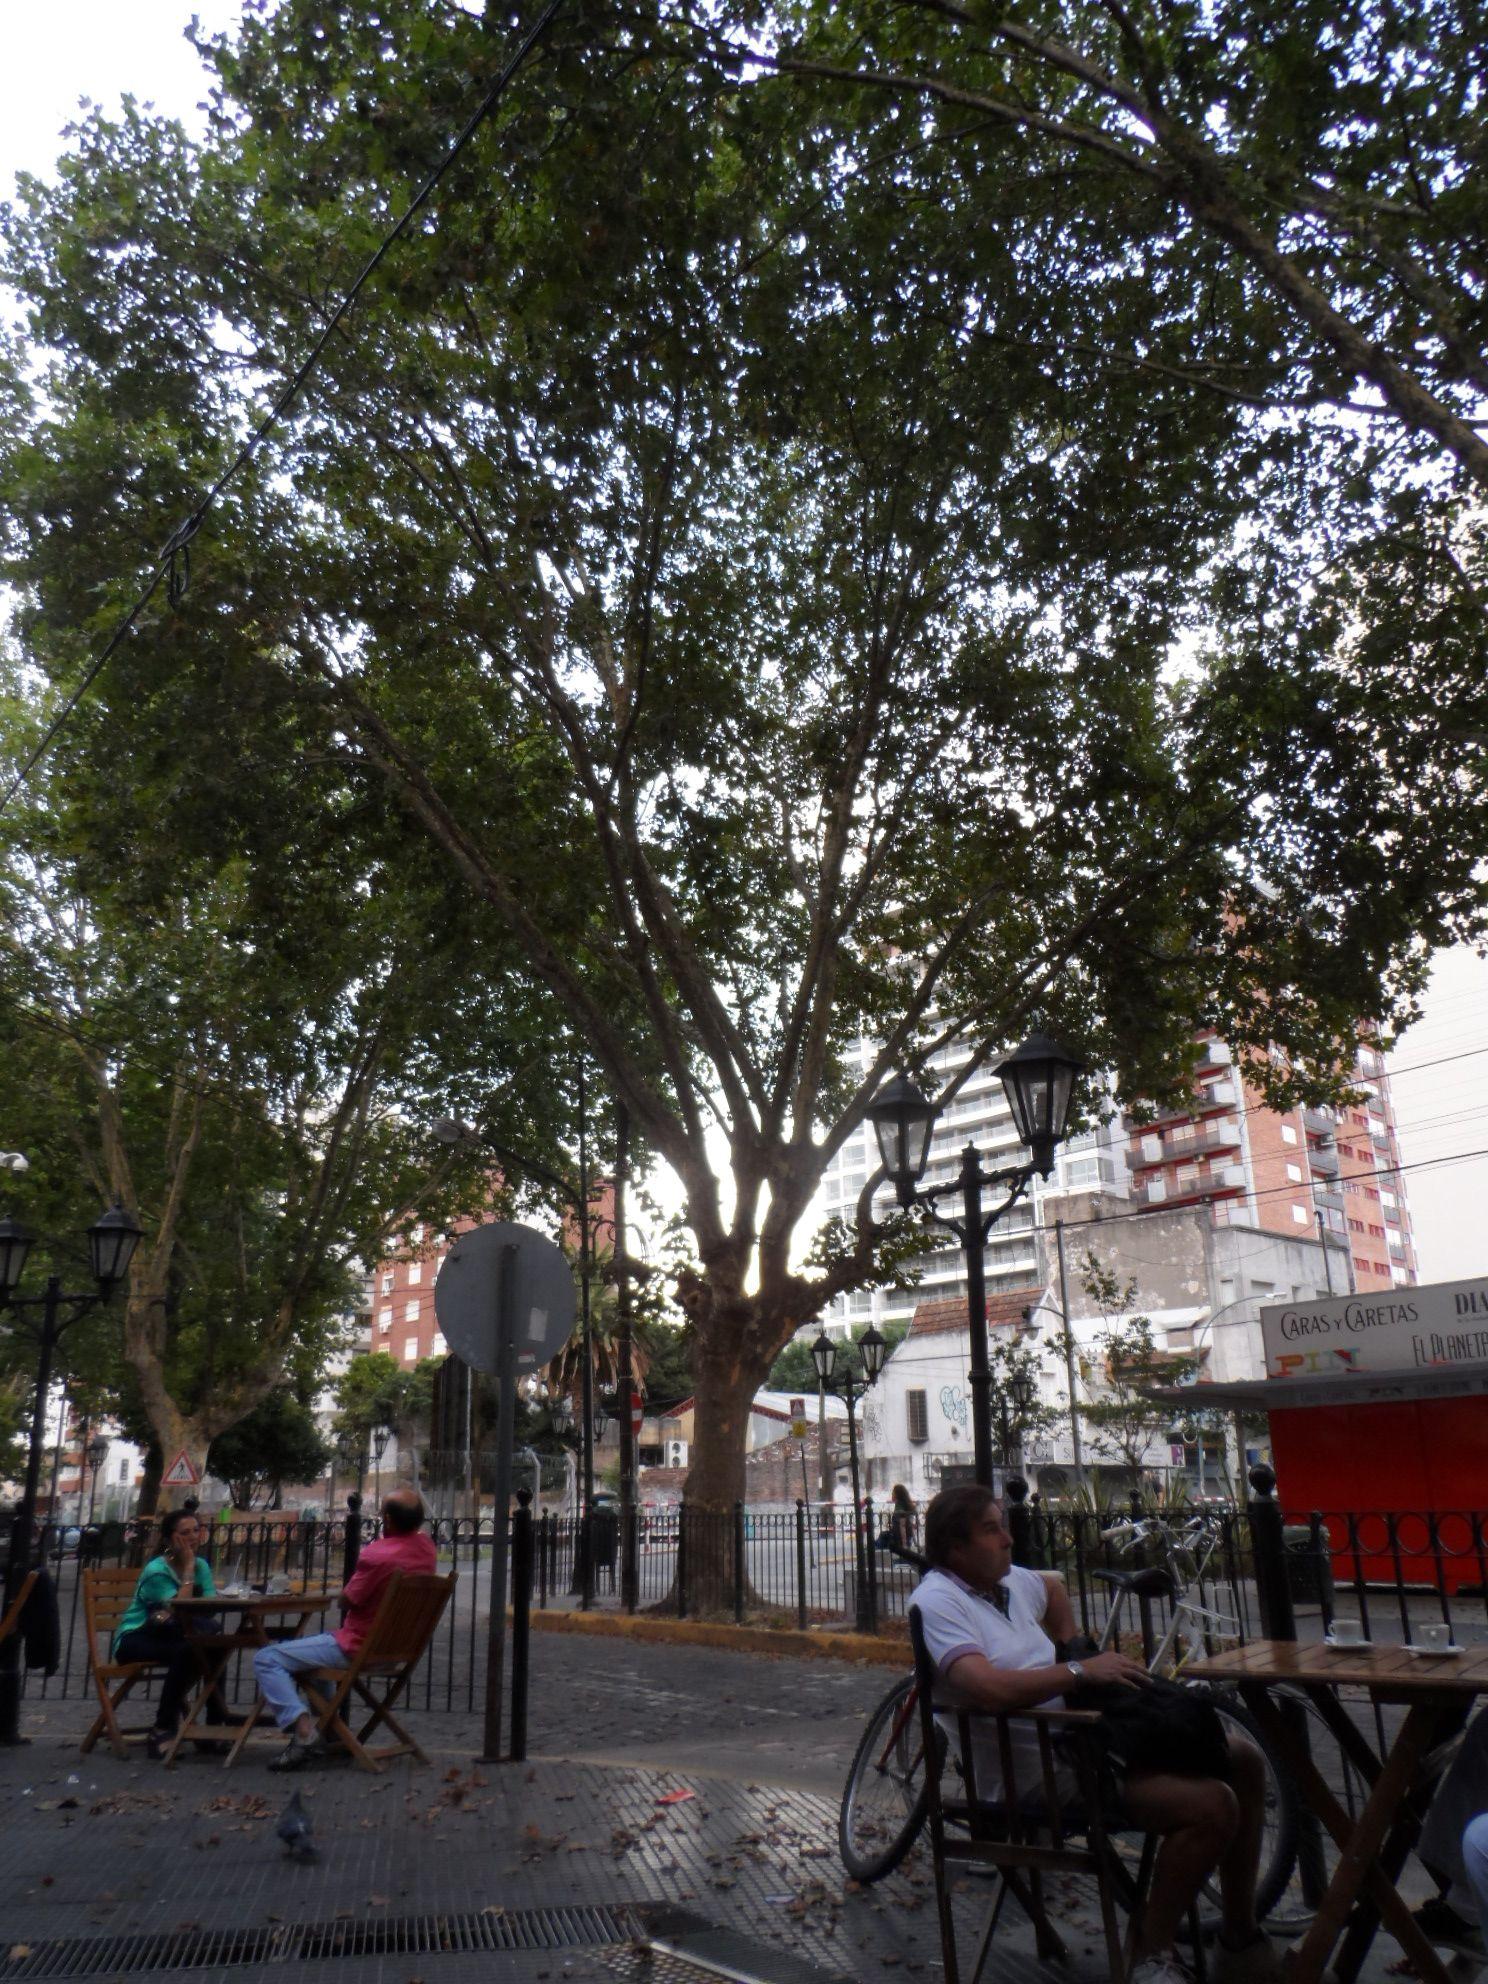 Calles de Vicente López Buenos aires, Argentina, Calle